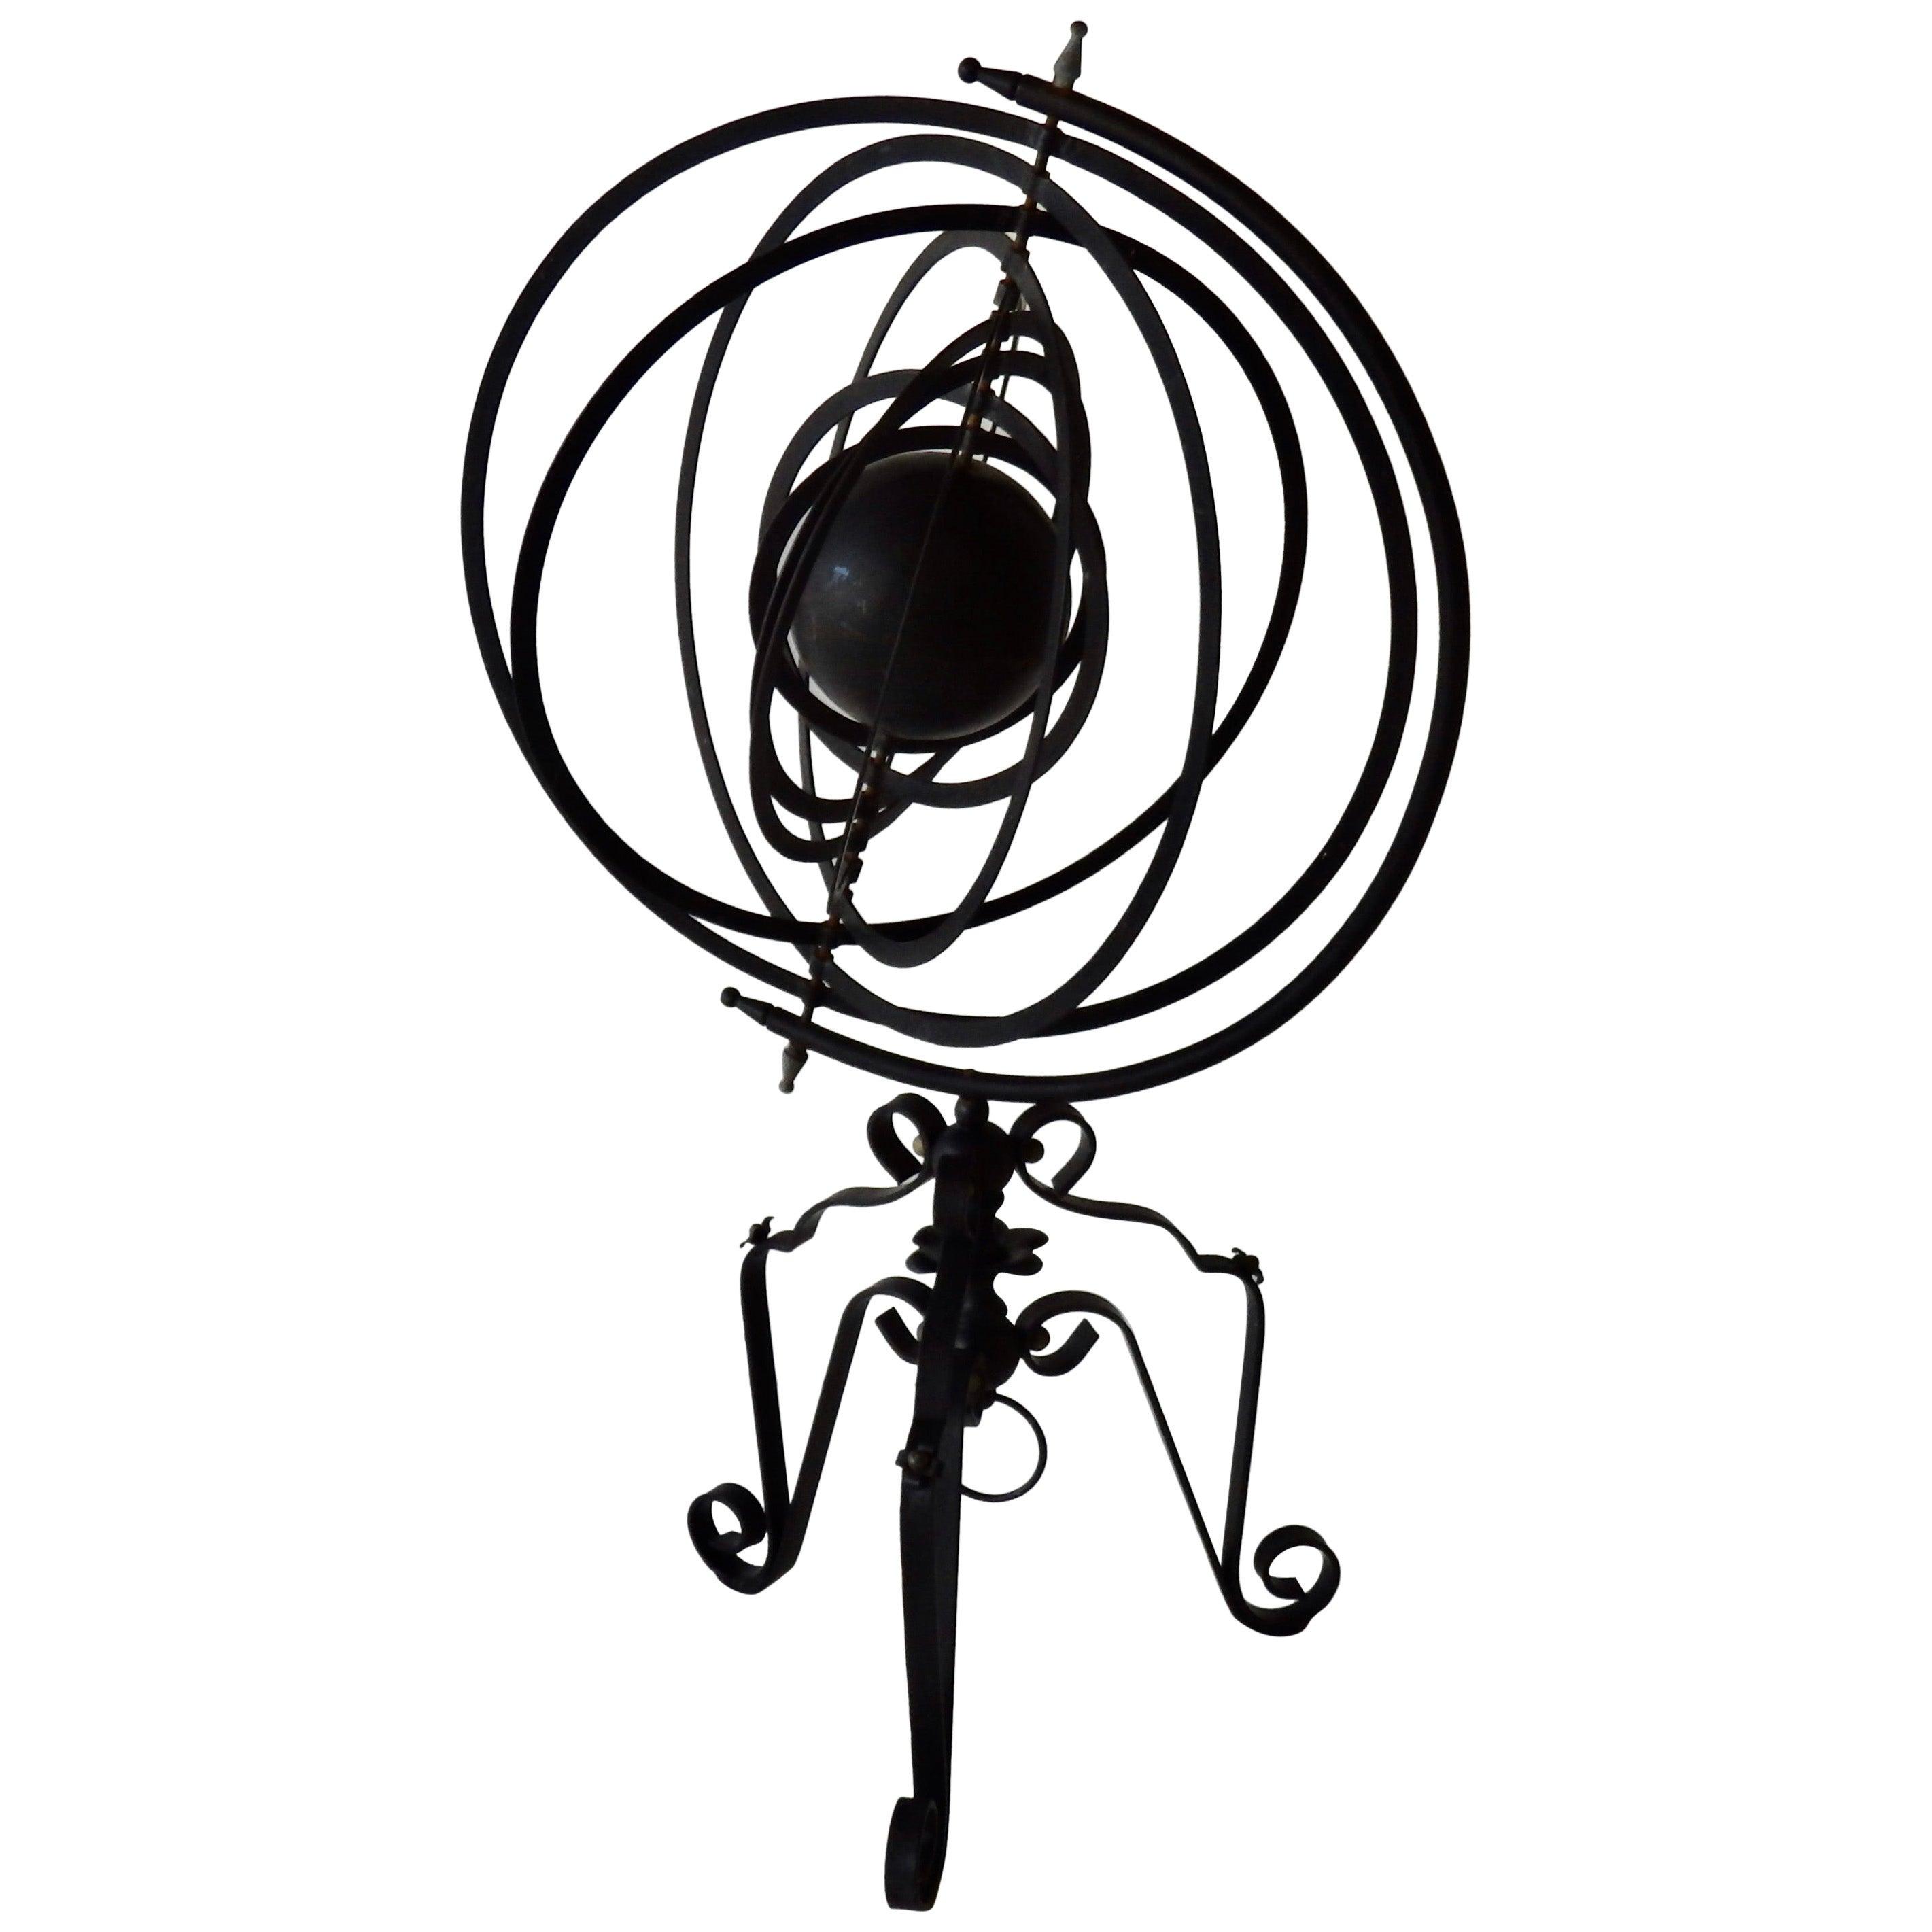 Wrought Iron Armillary Sphere Sculpture